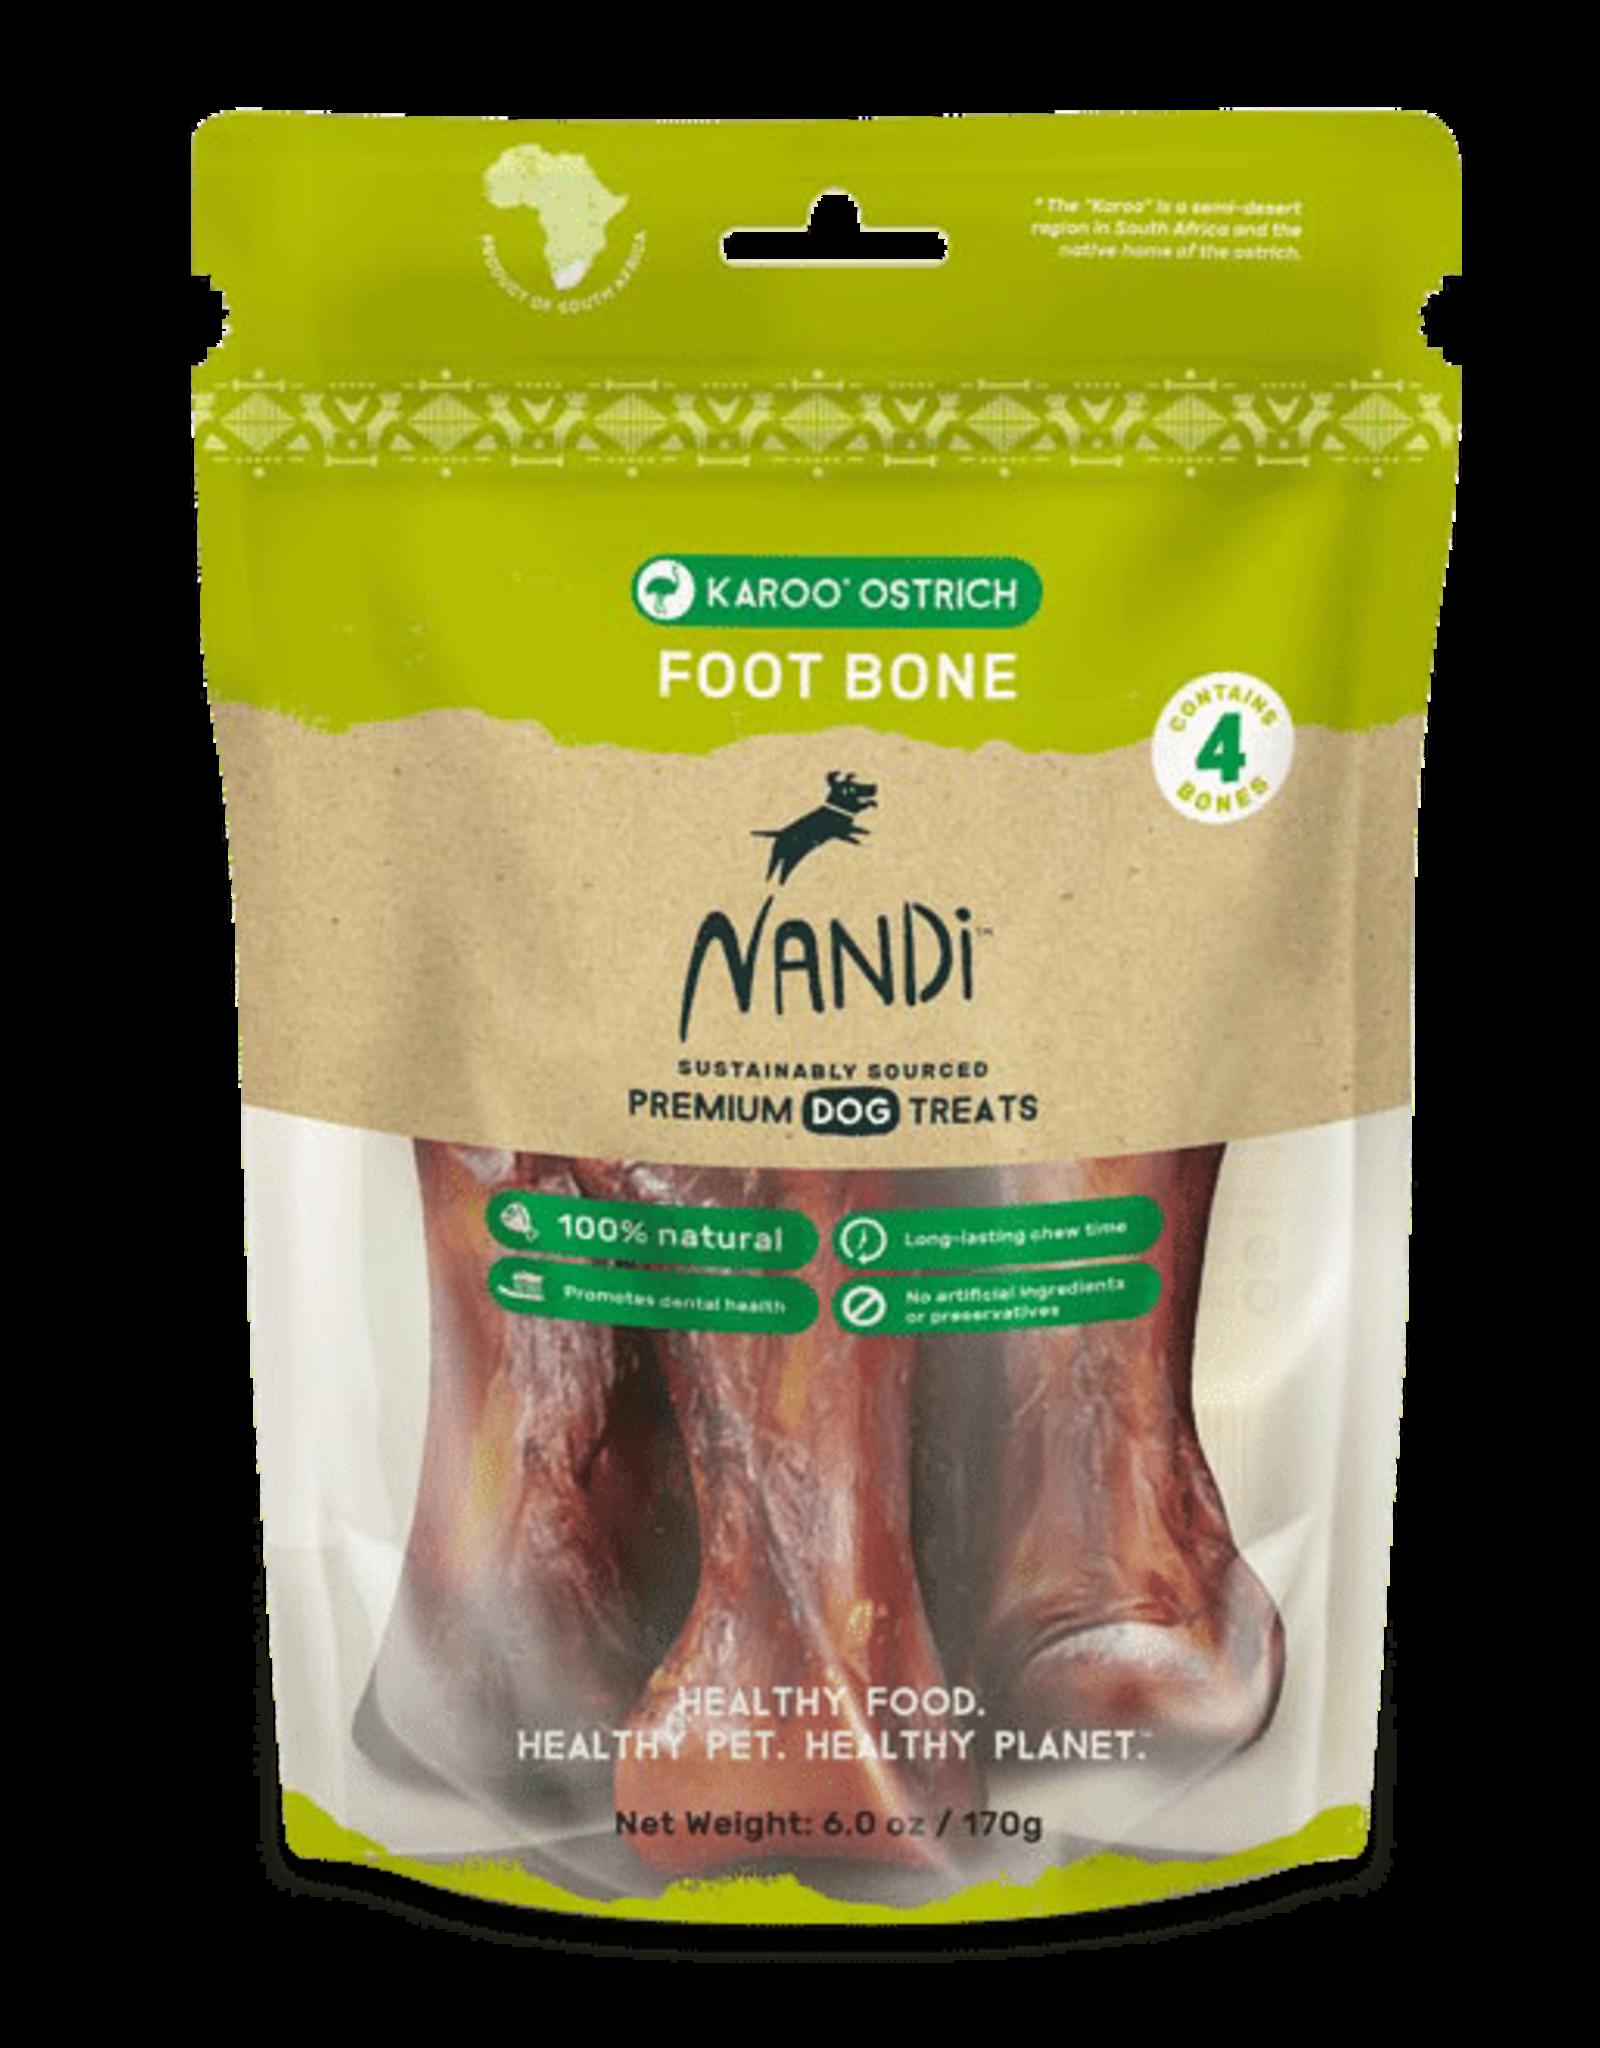 Nandi Nandi Karoo Ostrich Foot Bone 4ct